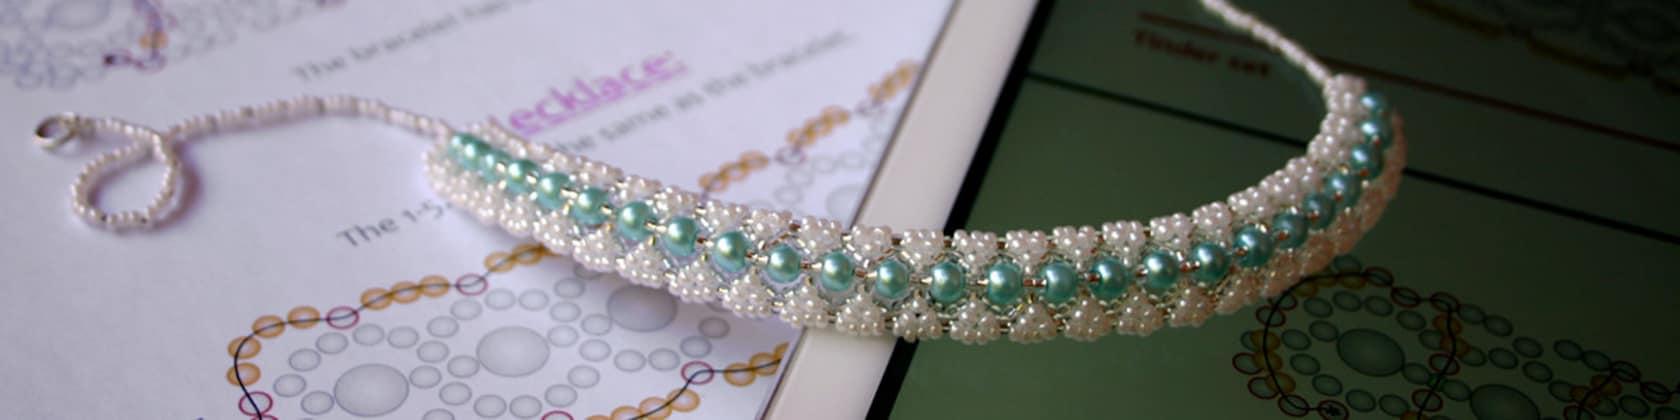 ccd89850c1e Assza s Jewelry Beading Patterns and Tutorials by AsszaBeadingArts